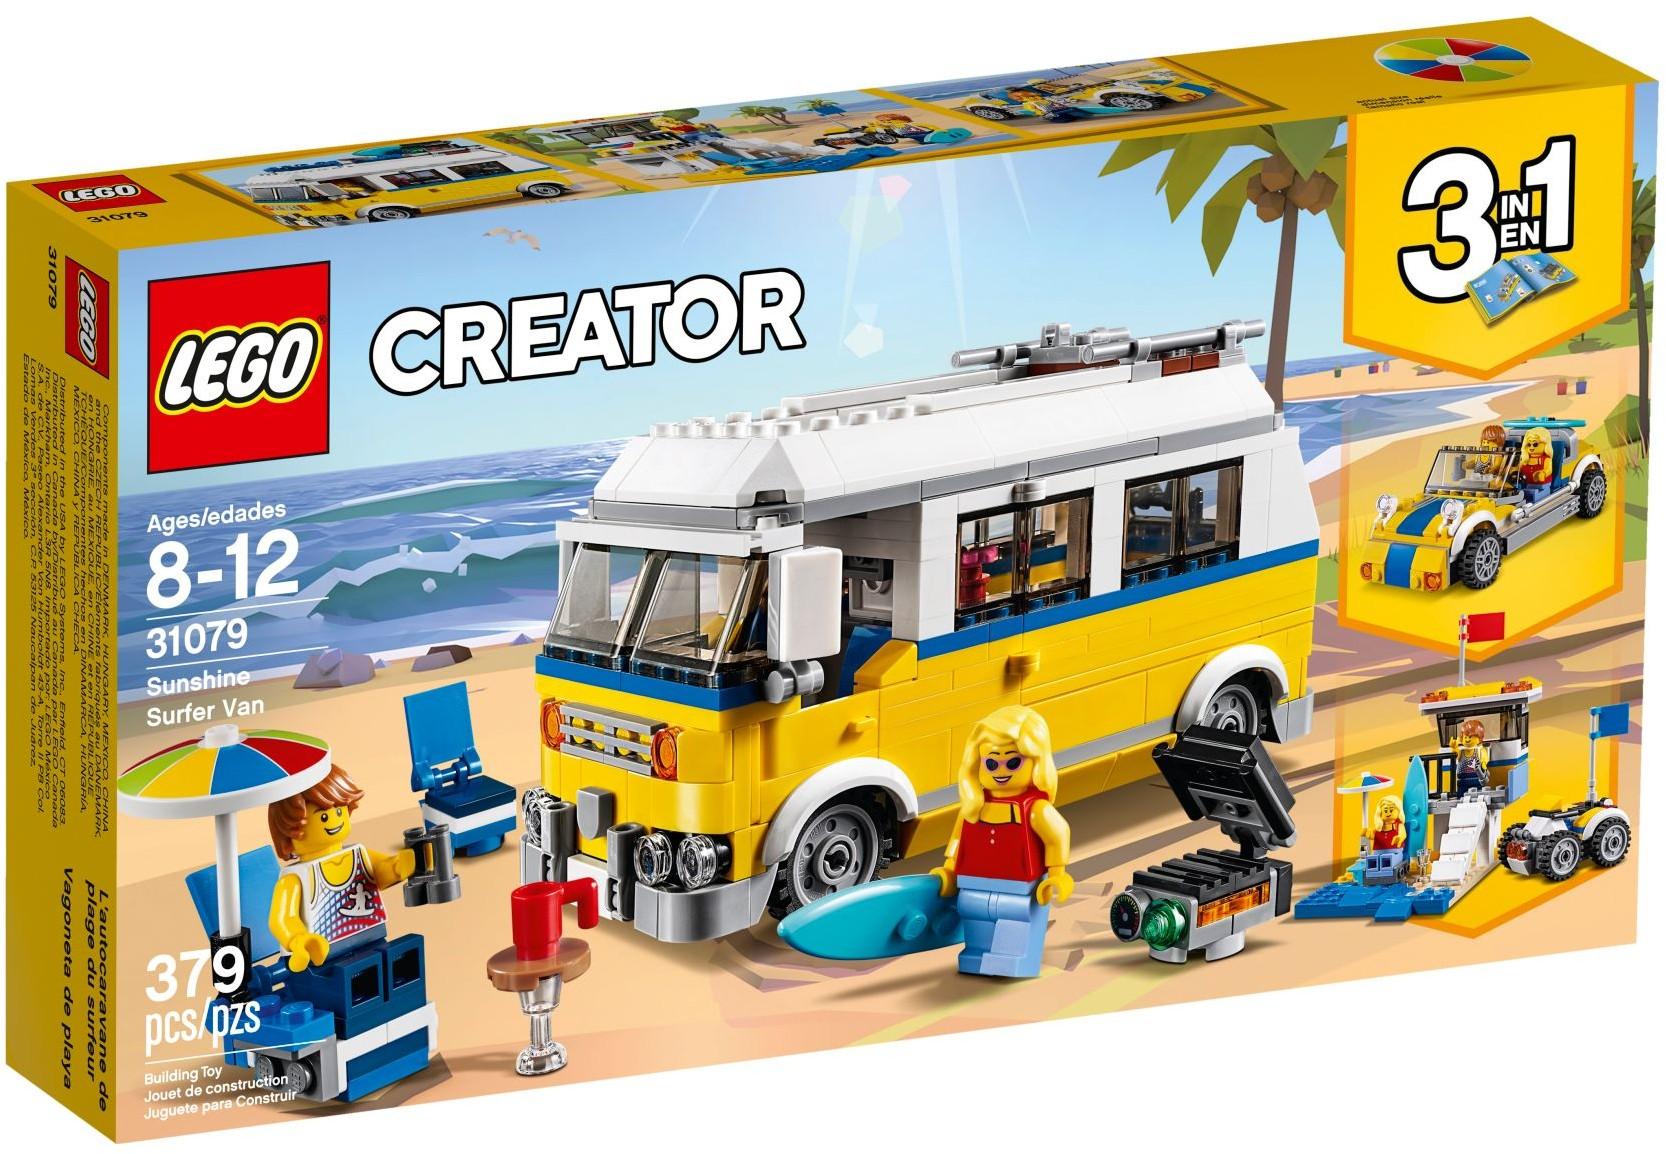 31079 Sunshine Surfer Van